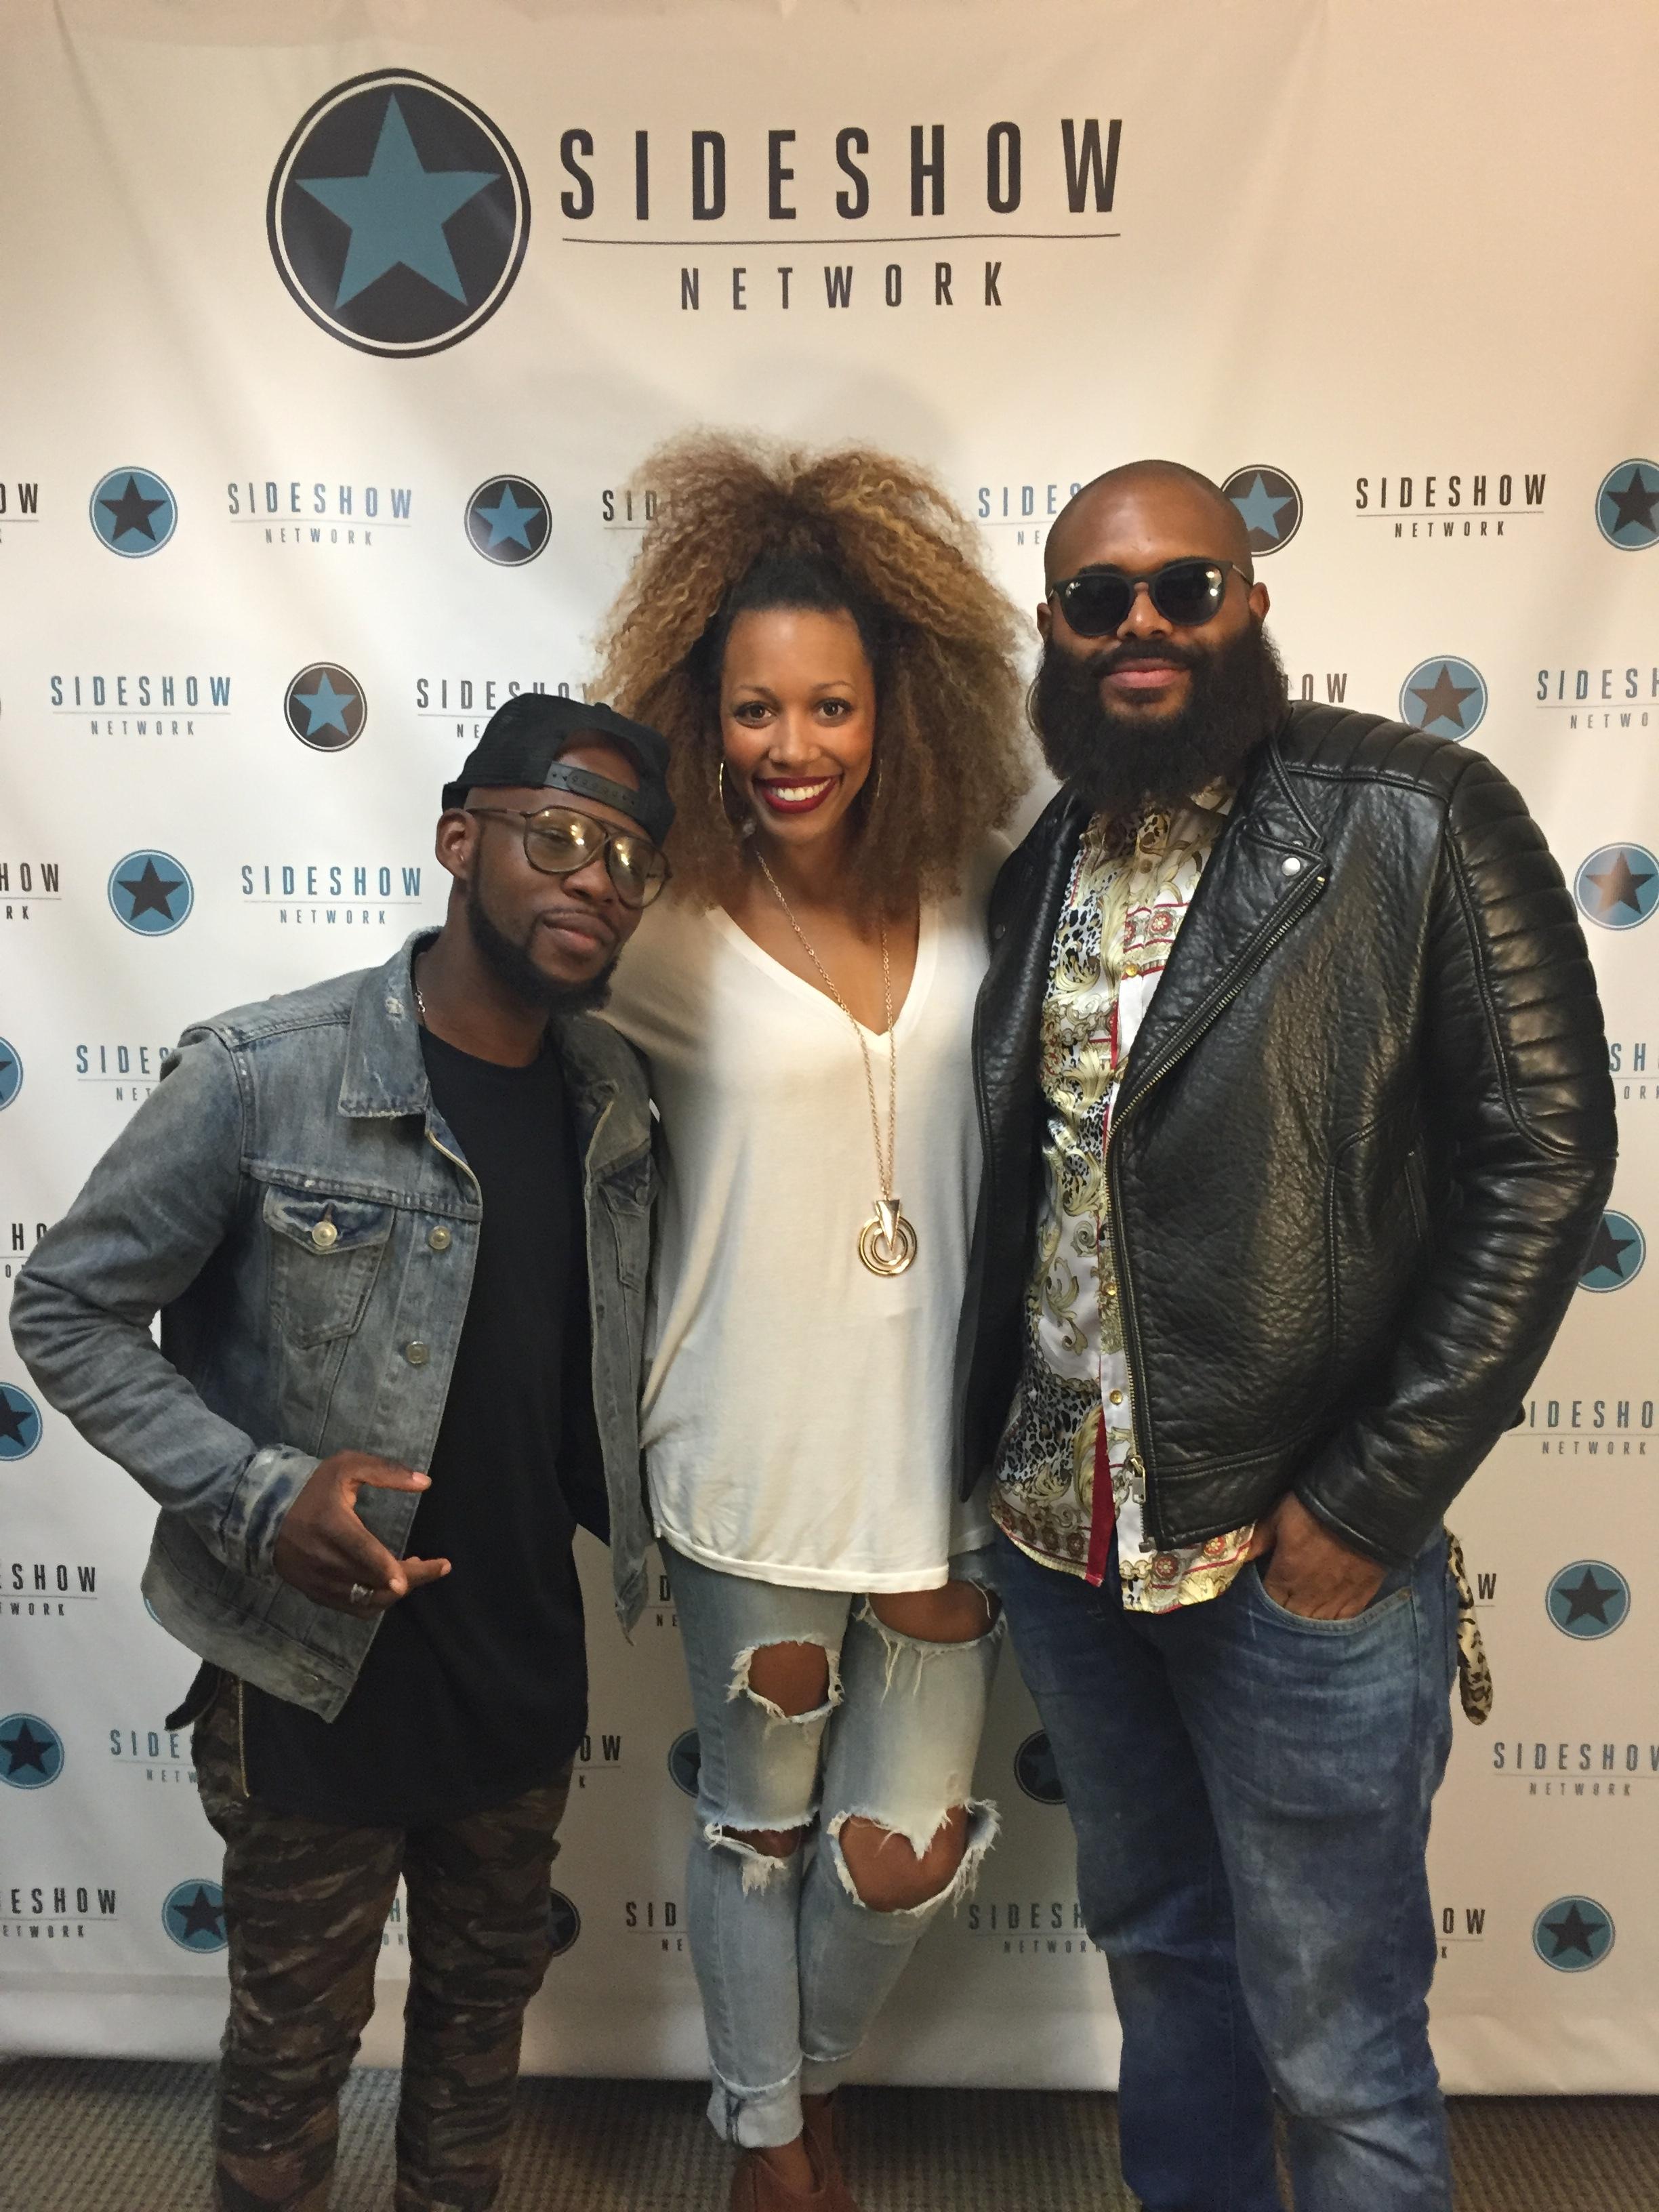 EPISODE #46 Artist Spotlight: Black Waat3r